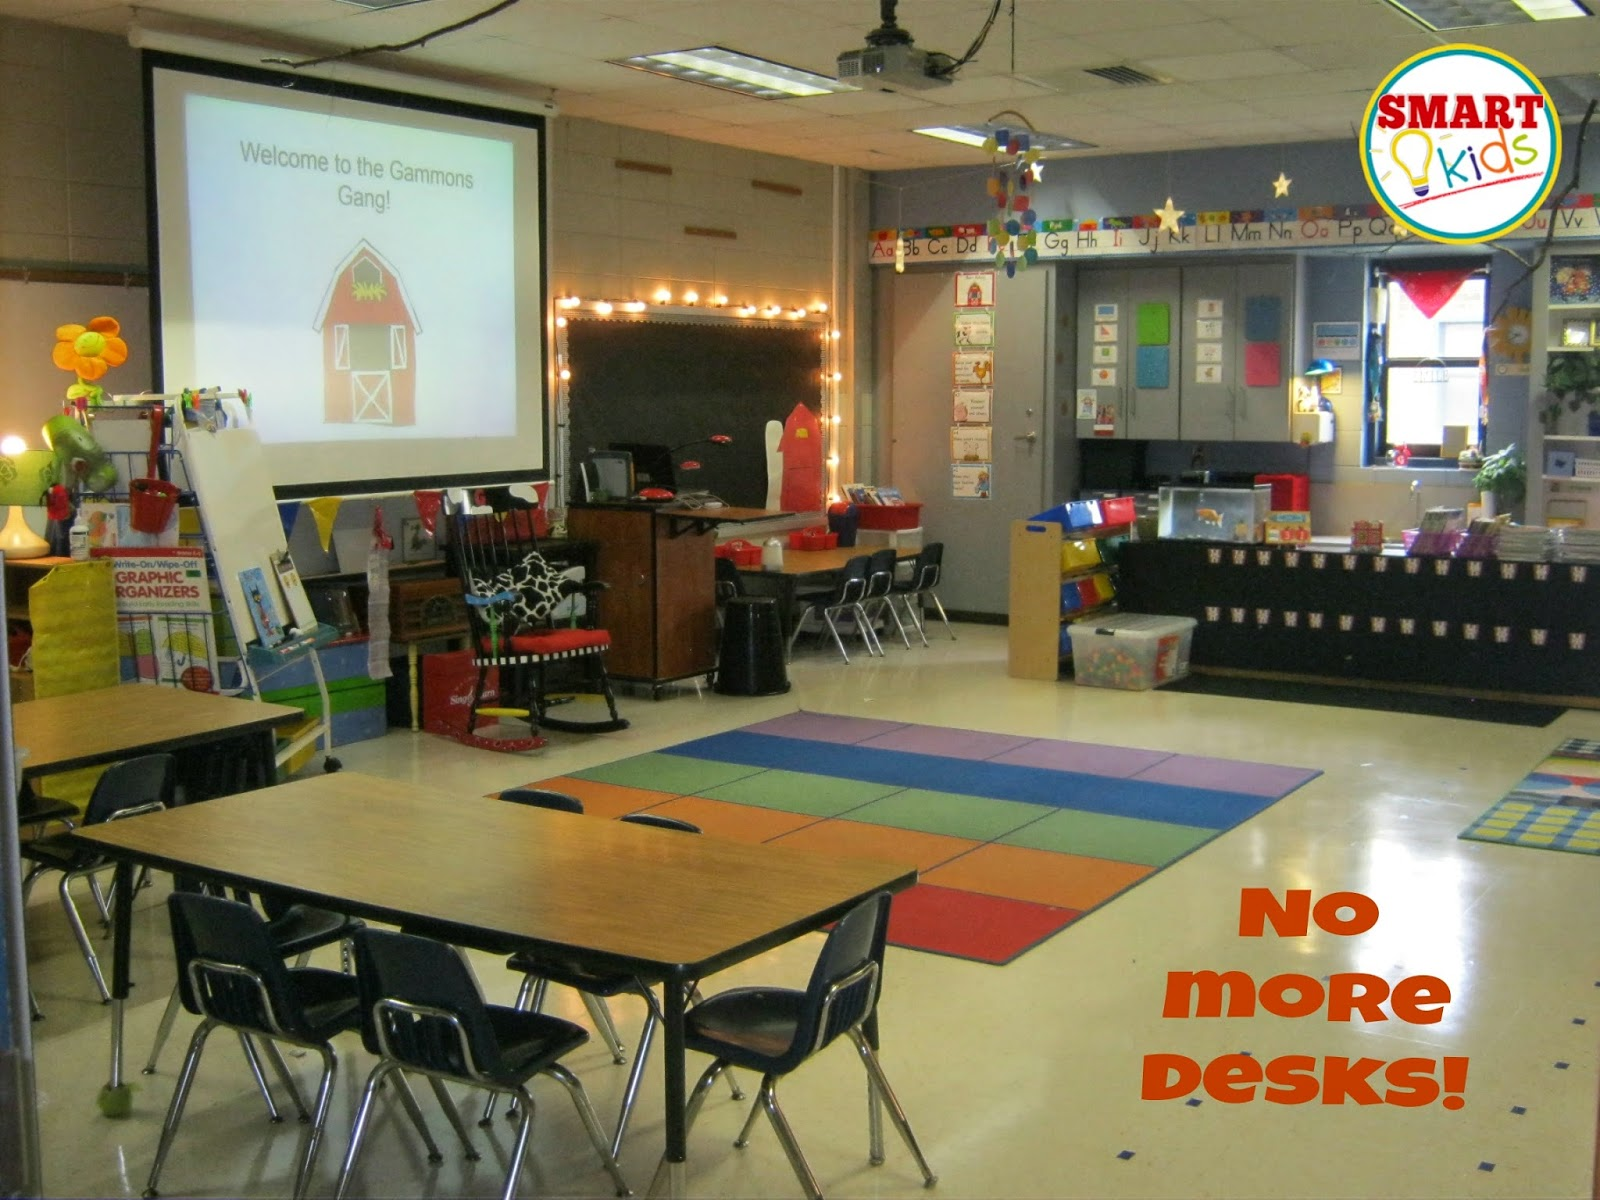 Smart Kids Bright Ideas Floor Desks Replace Furniture